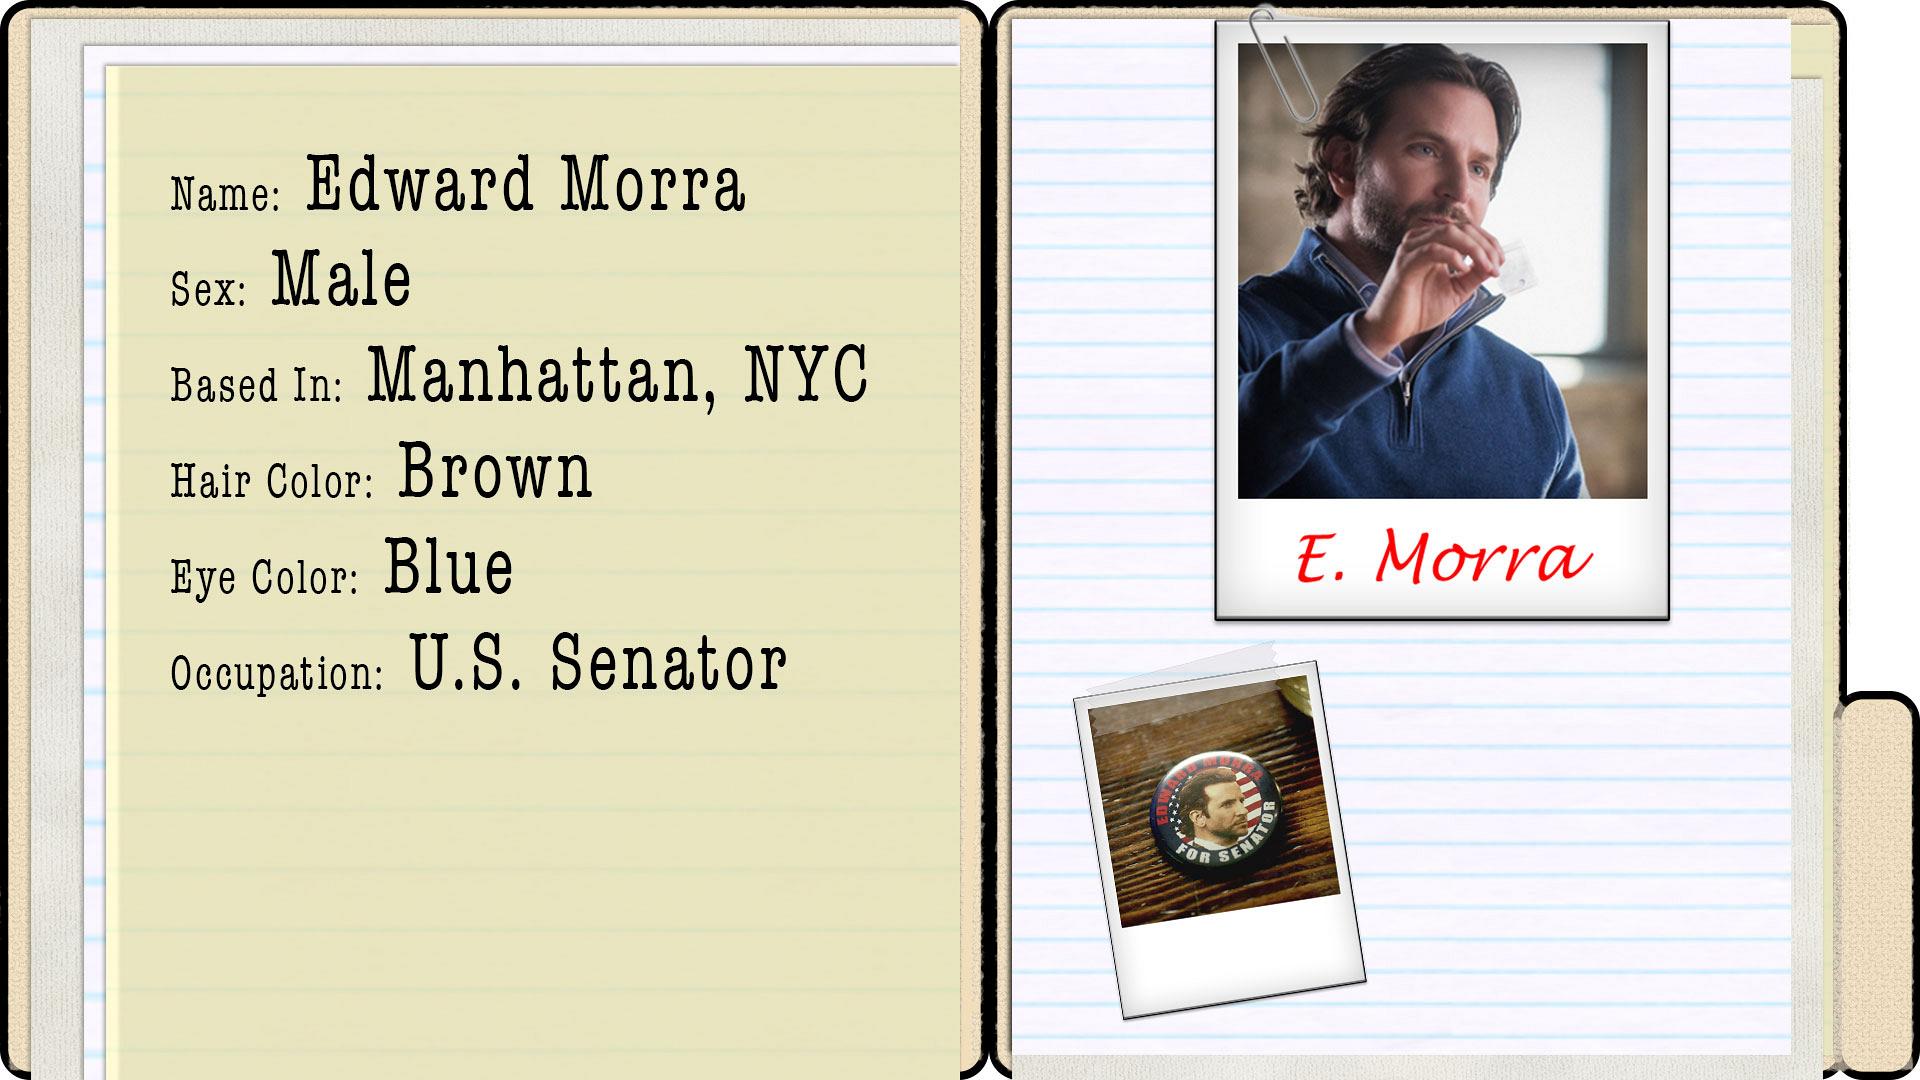 Senator Edward Morra: